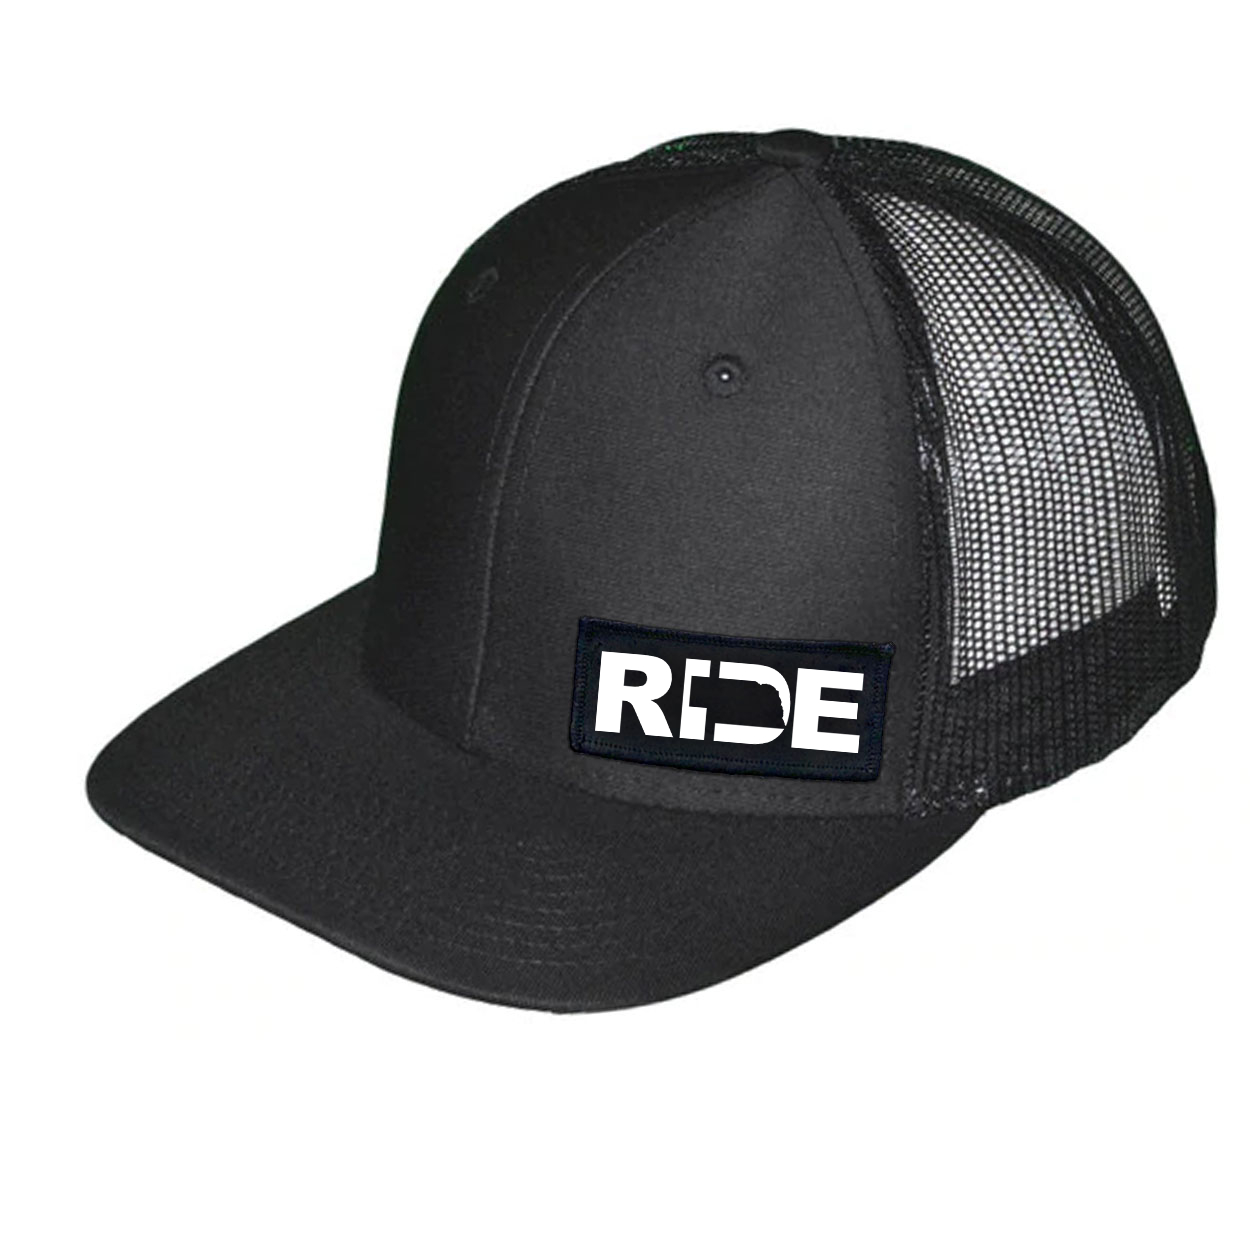 Ride Nebraska Night Out Woven Patch Snapback Trucker Hat Black (White Logo)